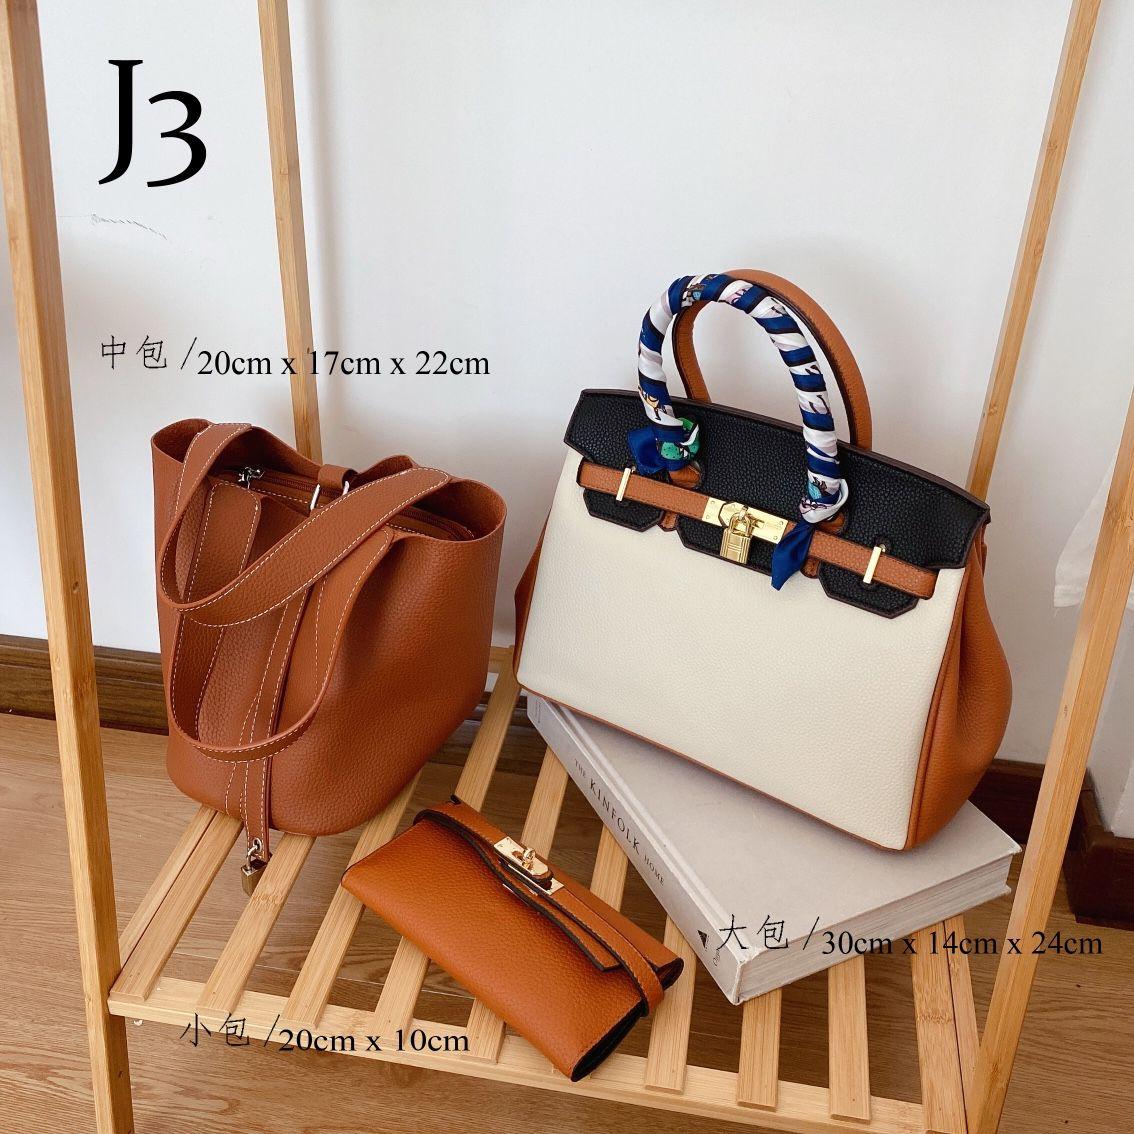 Women's Handbags Wallets Bucket Bag Three Packs Promotion High-end Luxury Couples Splicing Bag Fashion Big-name Models Wholesale